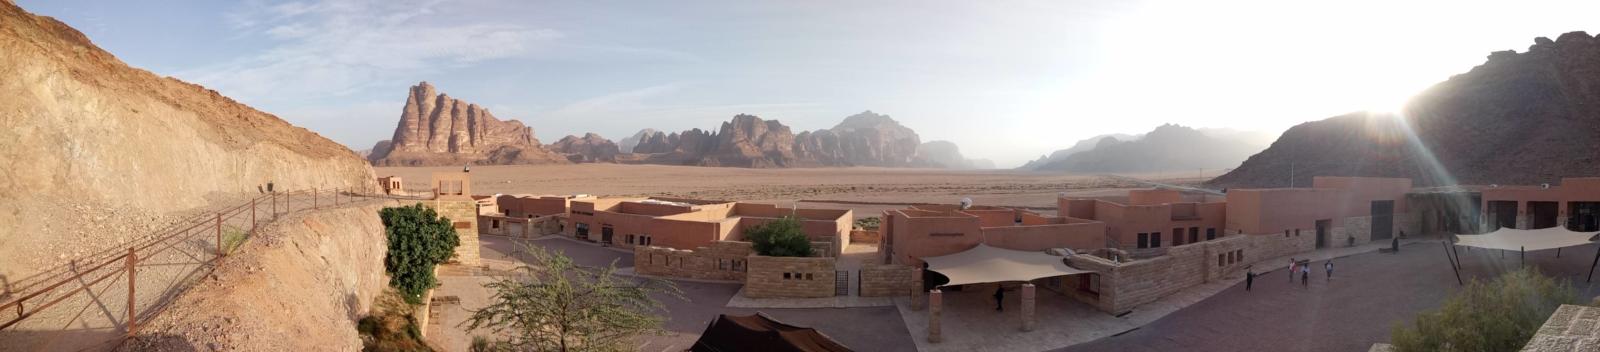 TUI_Jordanien_Wadi Rum